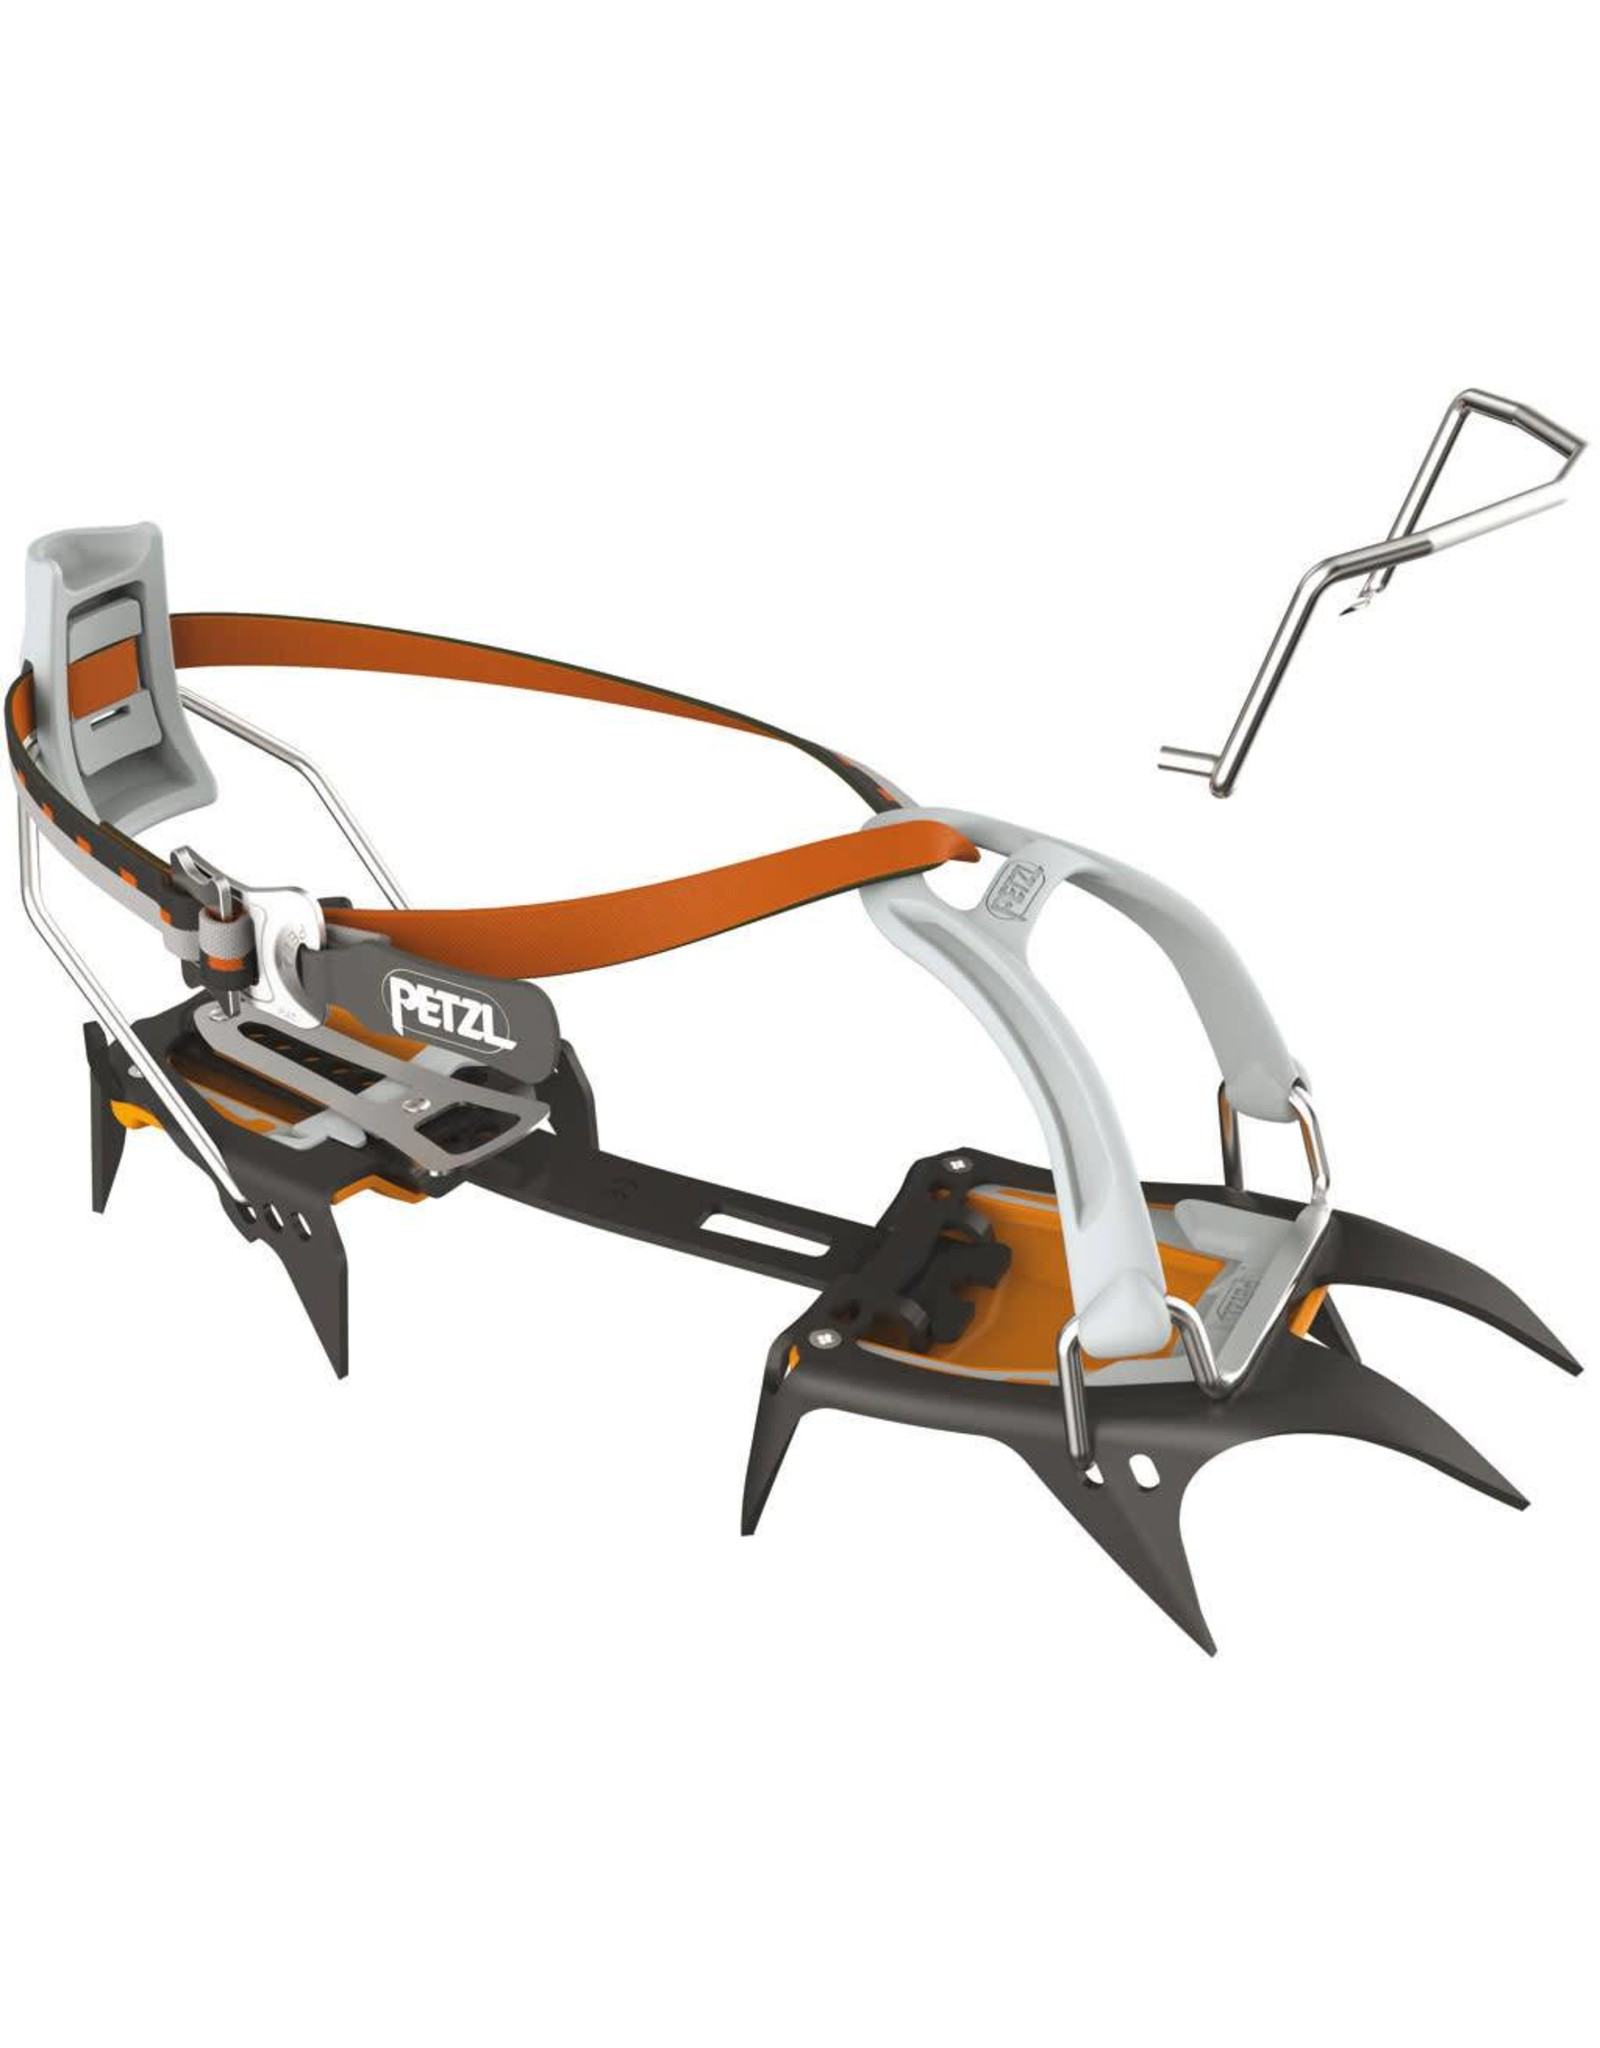 Petzl Petzl Irvis  Crampon - Leverlock Universal